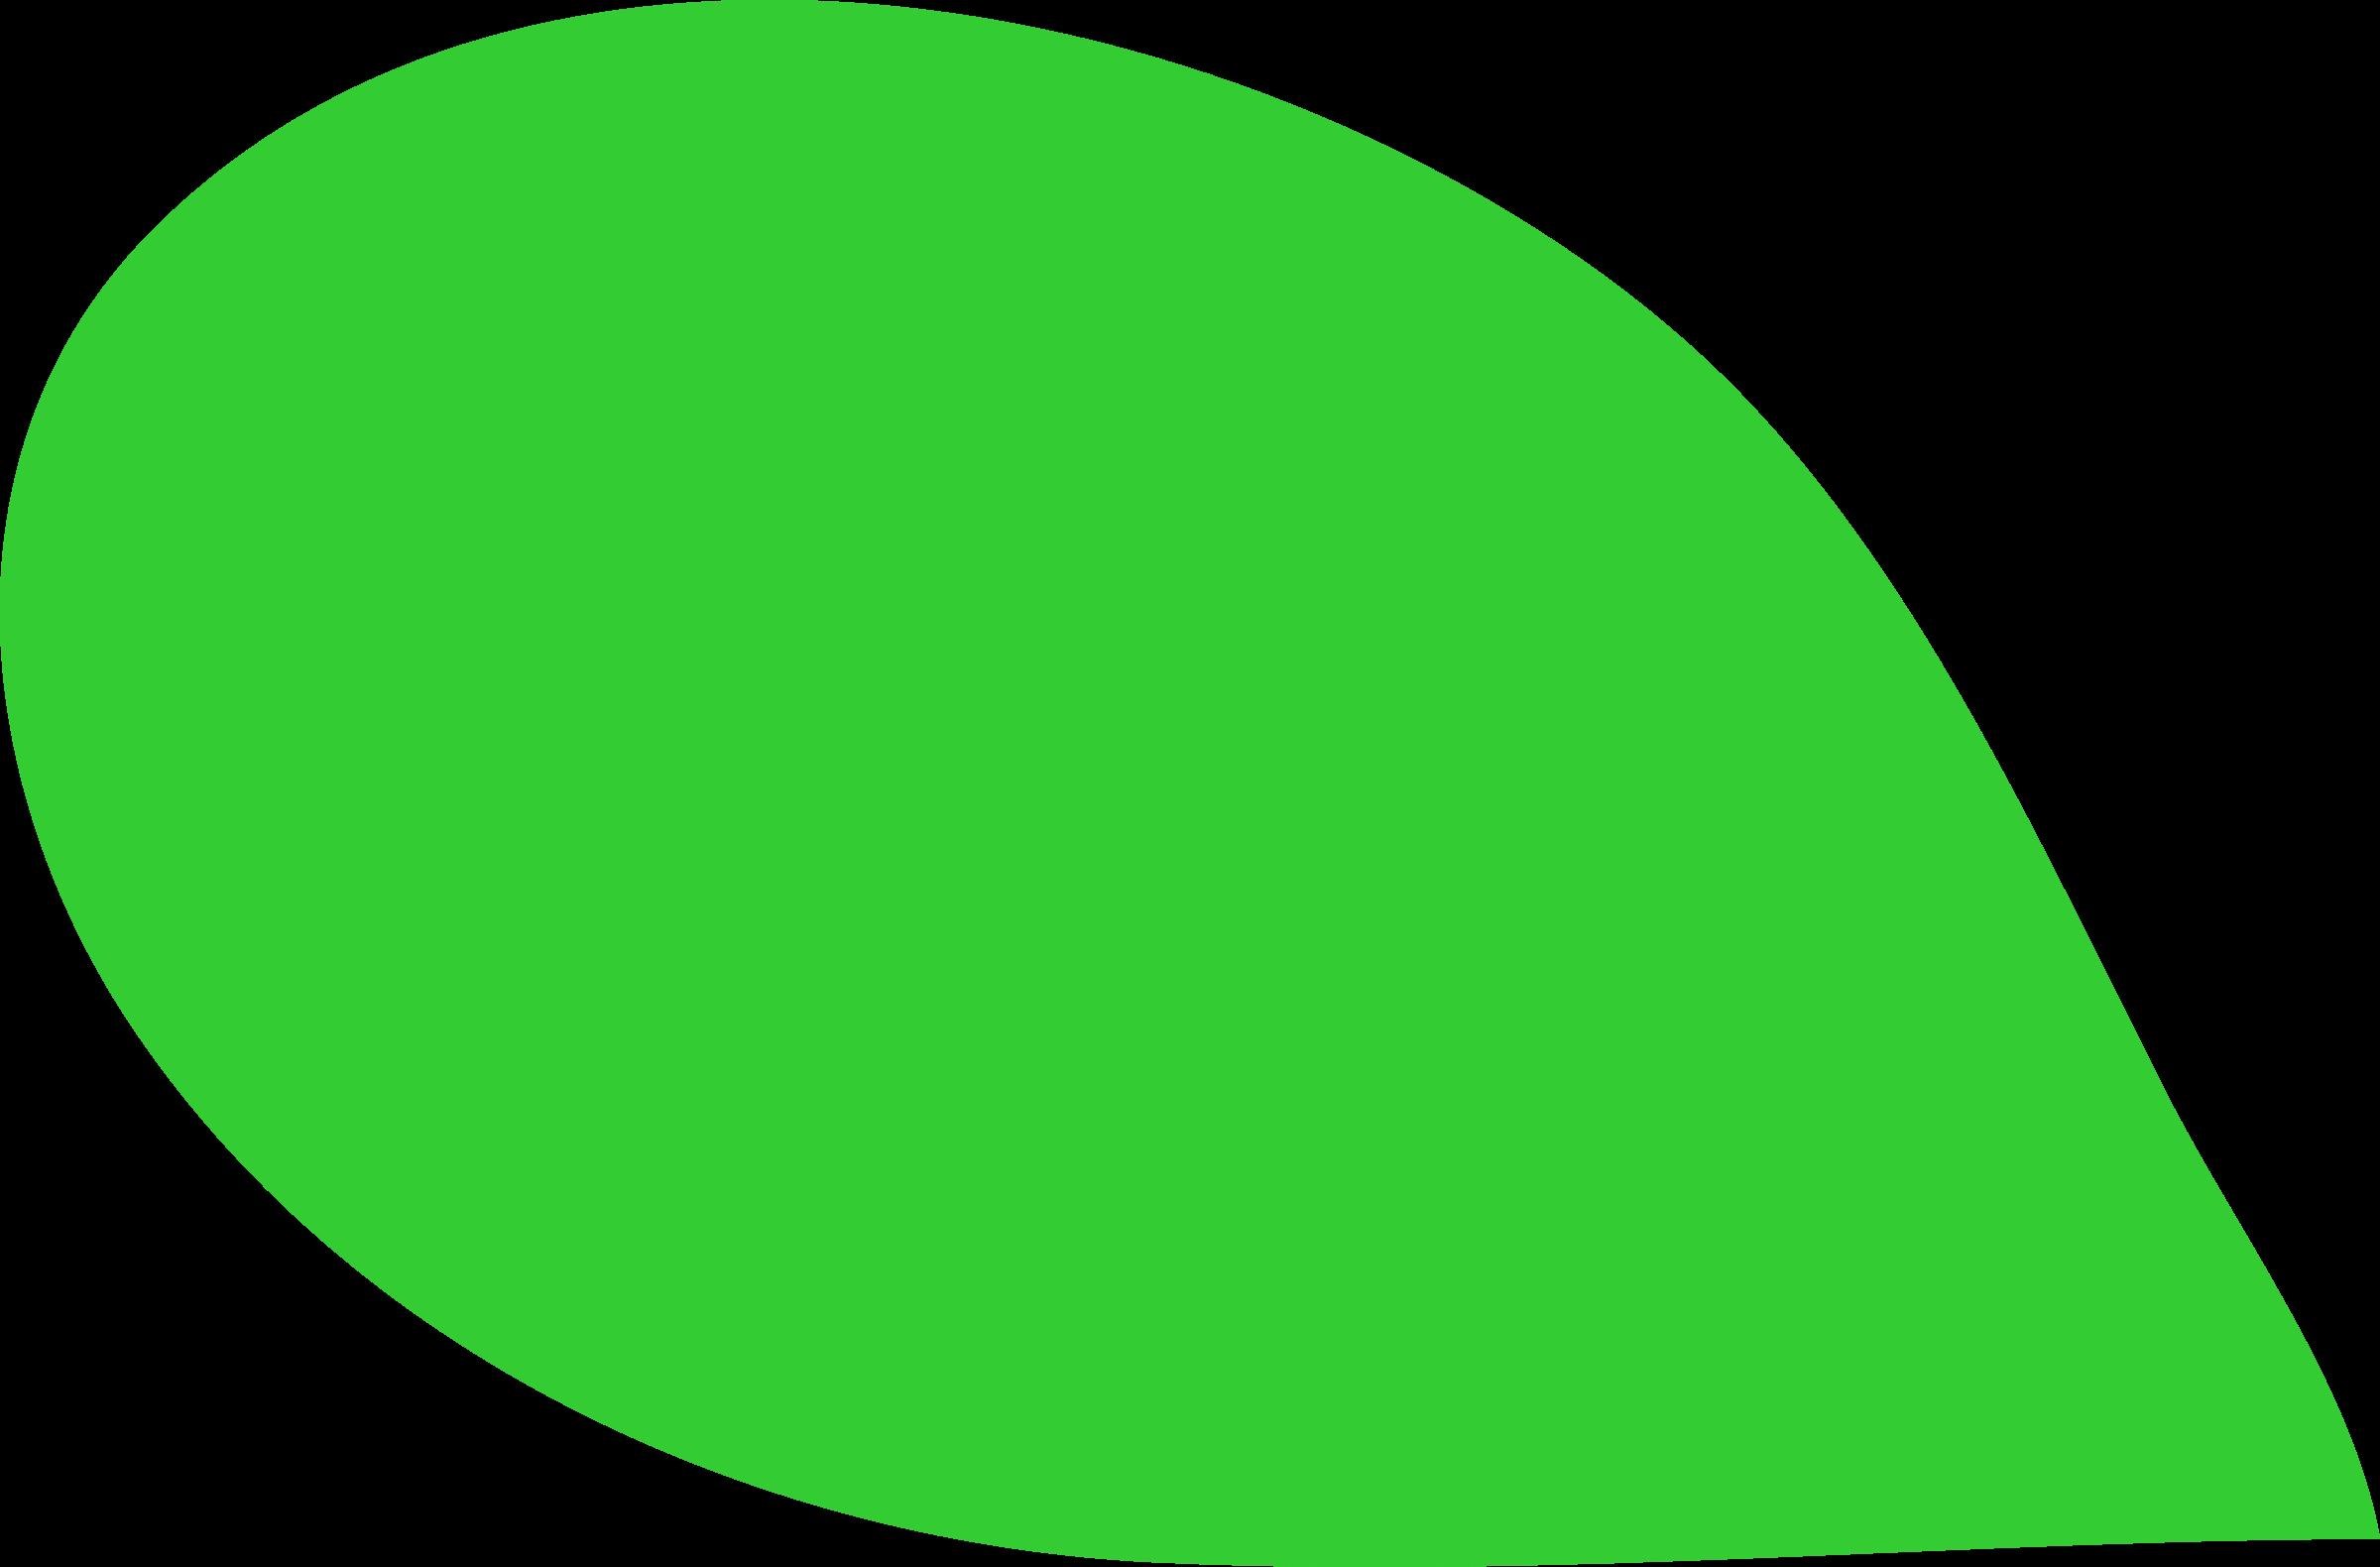 BIG IMAGE (PNG)